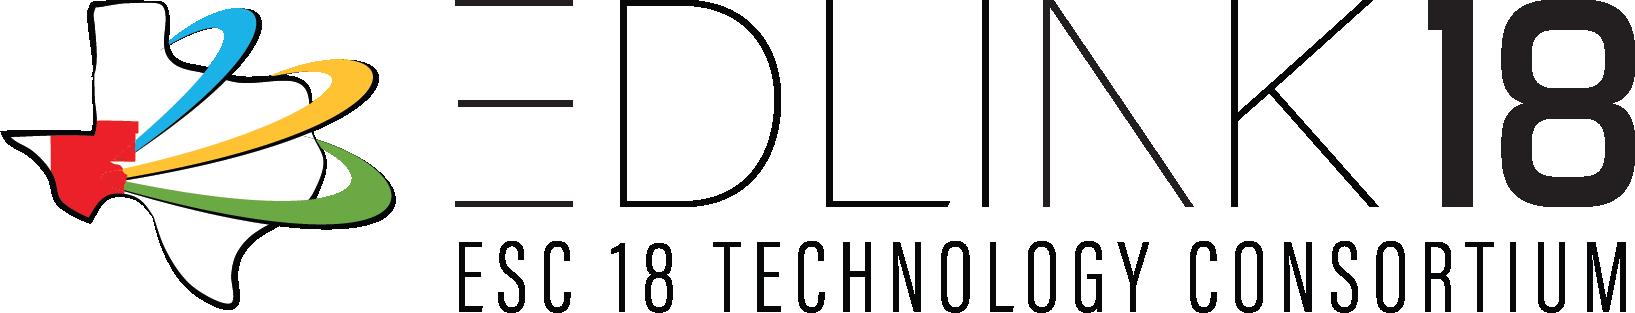 EDLINK18 Logo